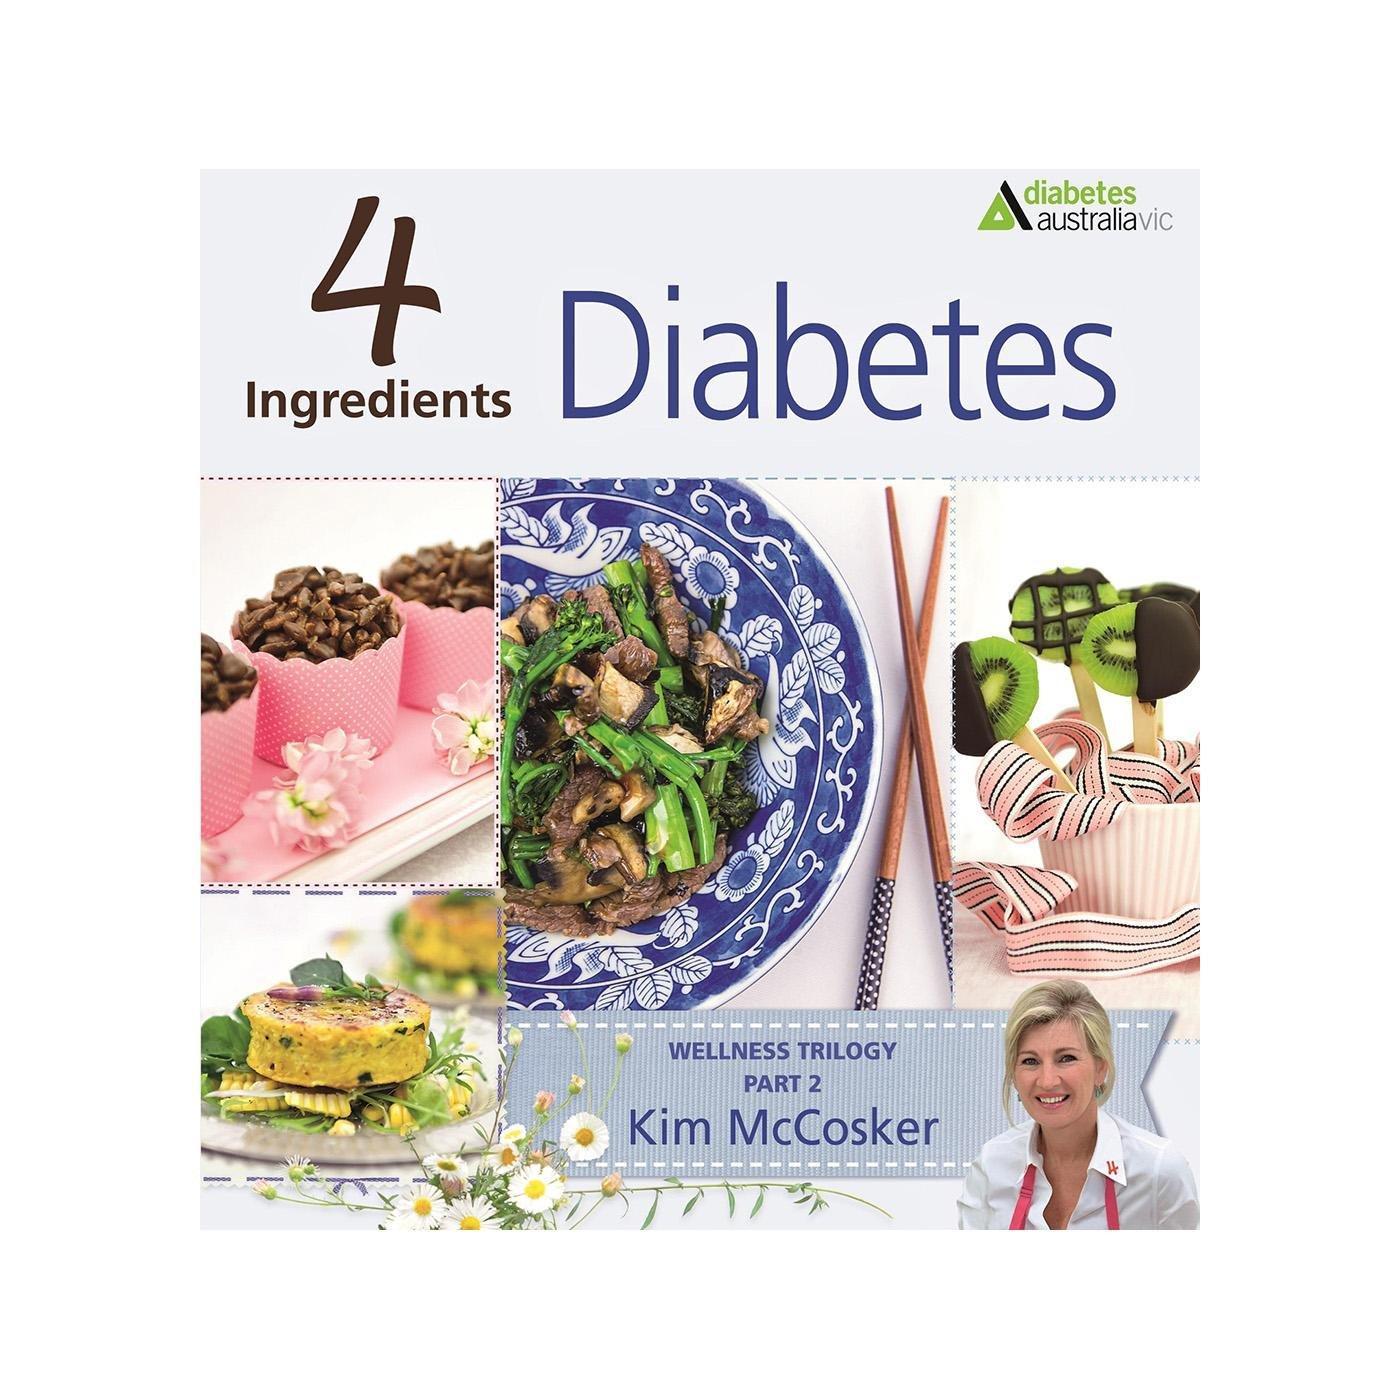 4 Ingredients Diabetes Recipes